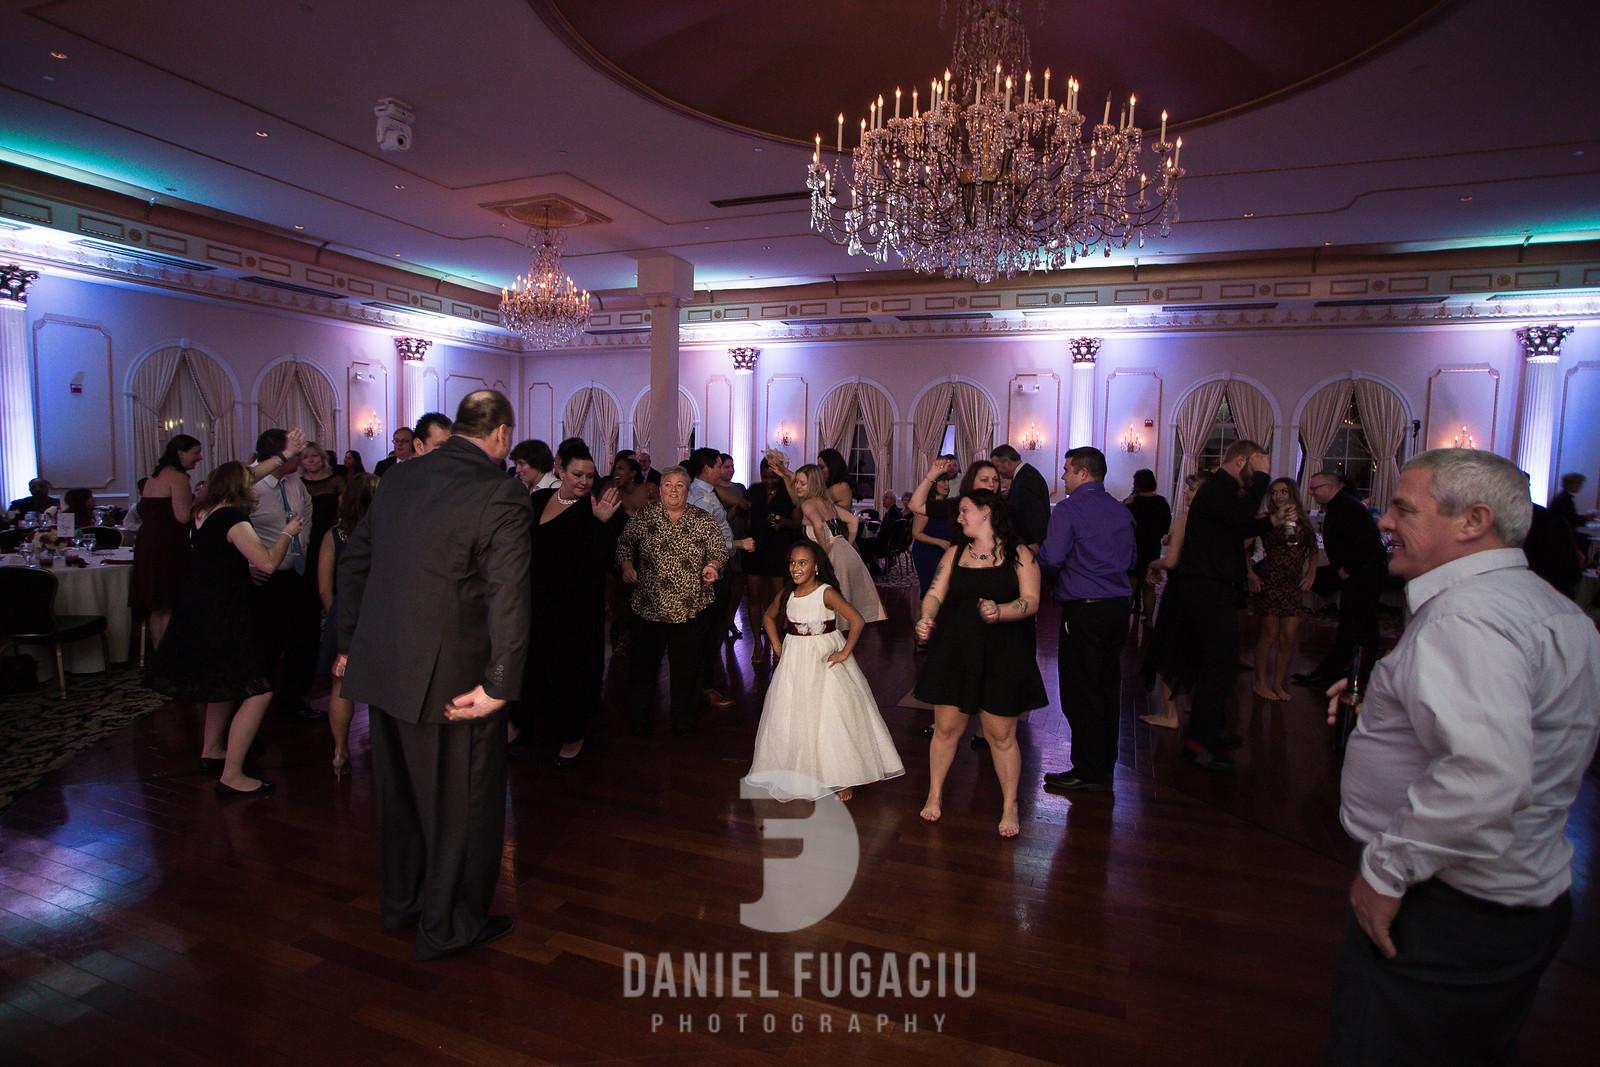 Daniel_Fugaciu_Photography_Liz_Rob_Real_Weddding_April_Lynn_Designs_The_Merion_New_Jersey_Brugundy_Gold_Wedding41